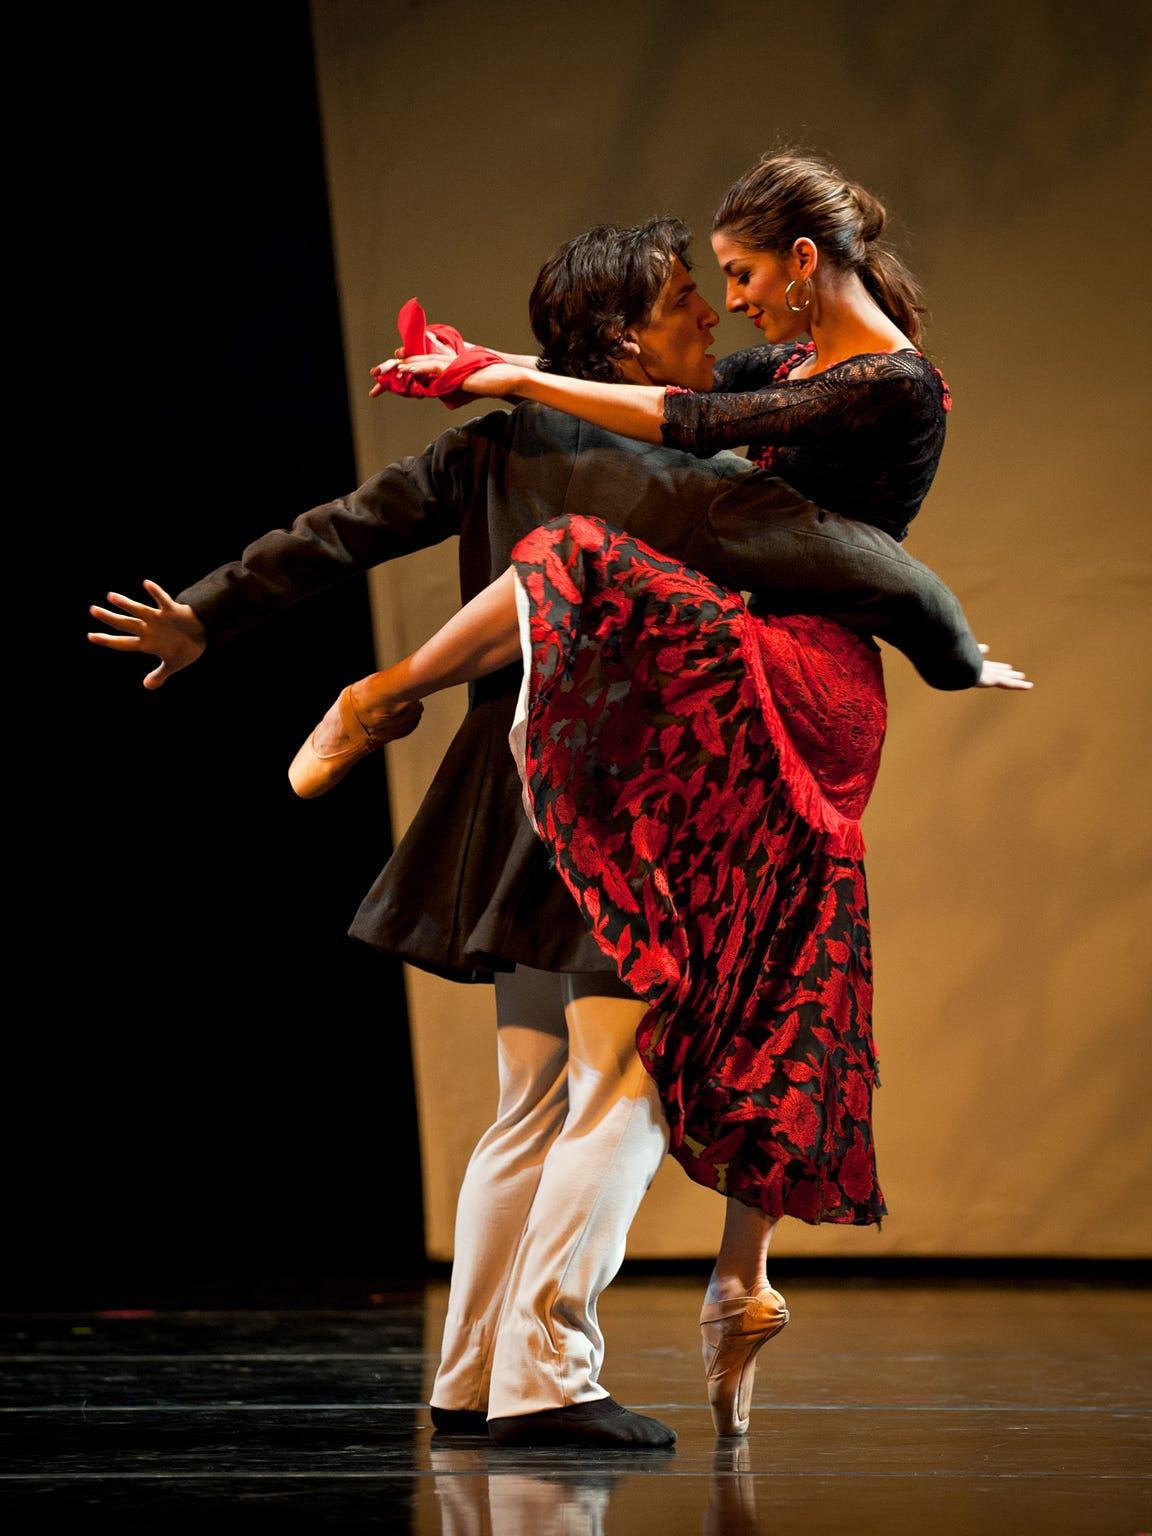 Carmen Diaz and Cervilio Miguel Amador perform in the